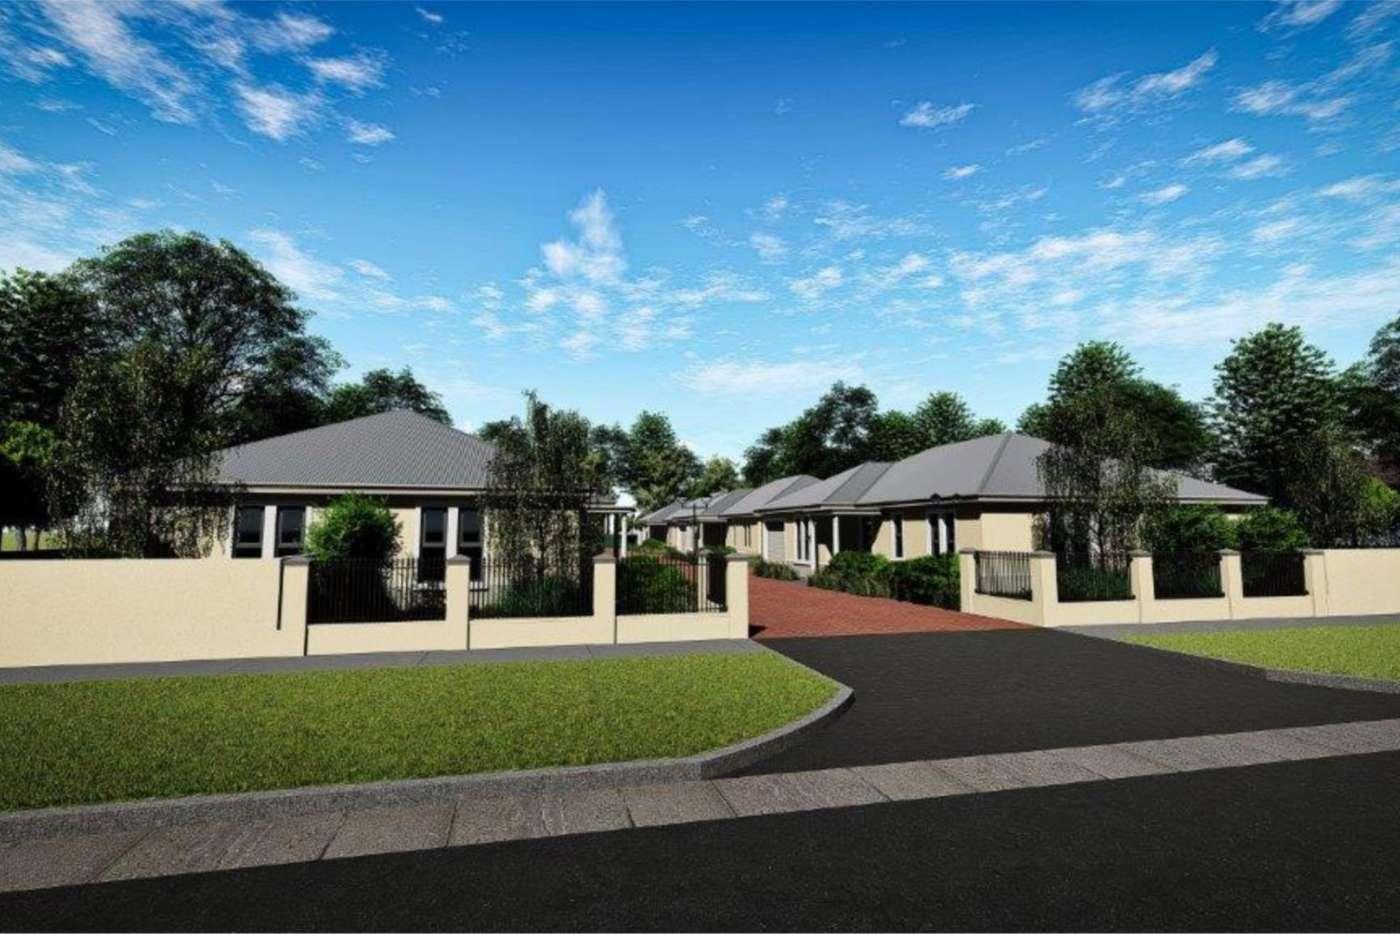 Main view of Homely residentialLand listing, 56 Sickerdick Street, Mannum SA 5238